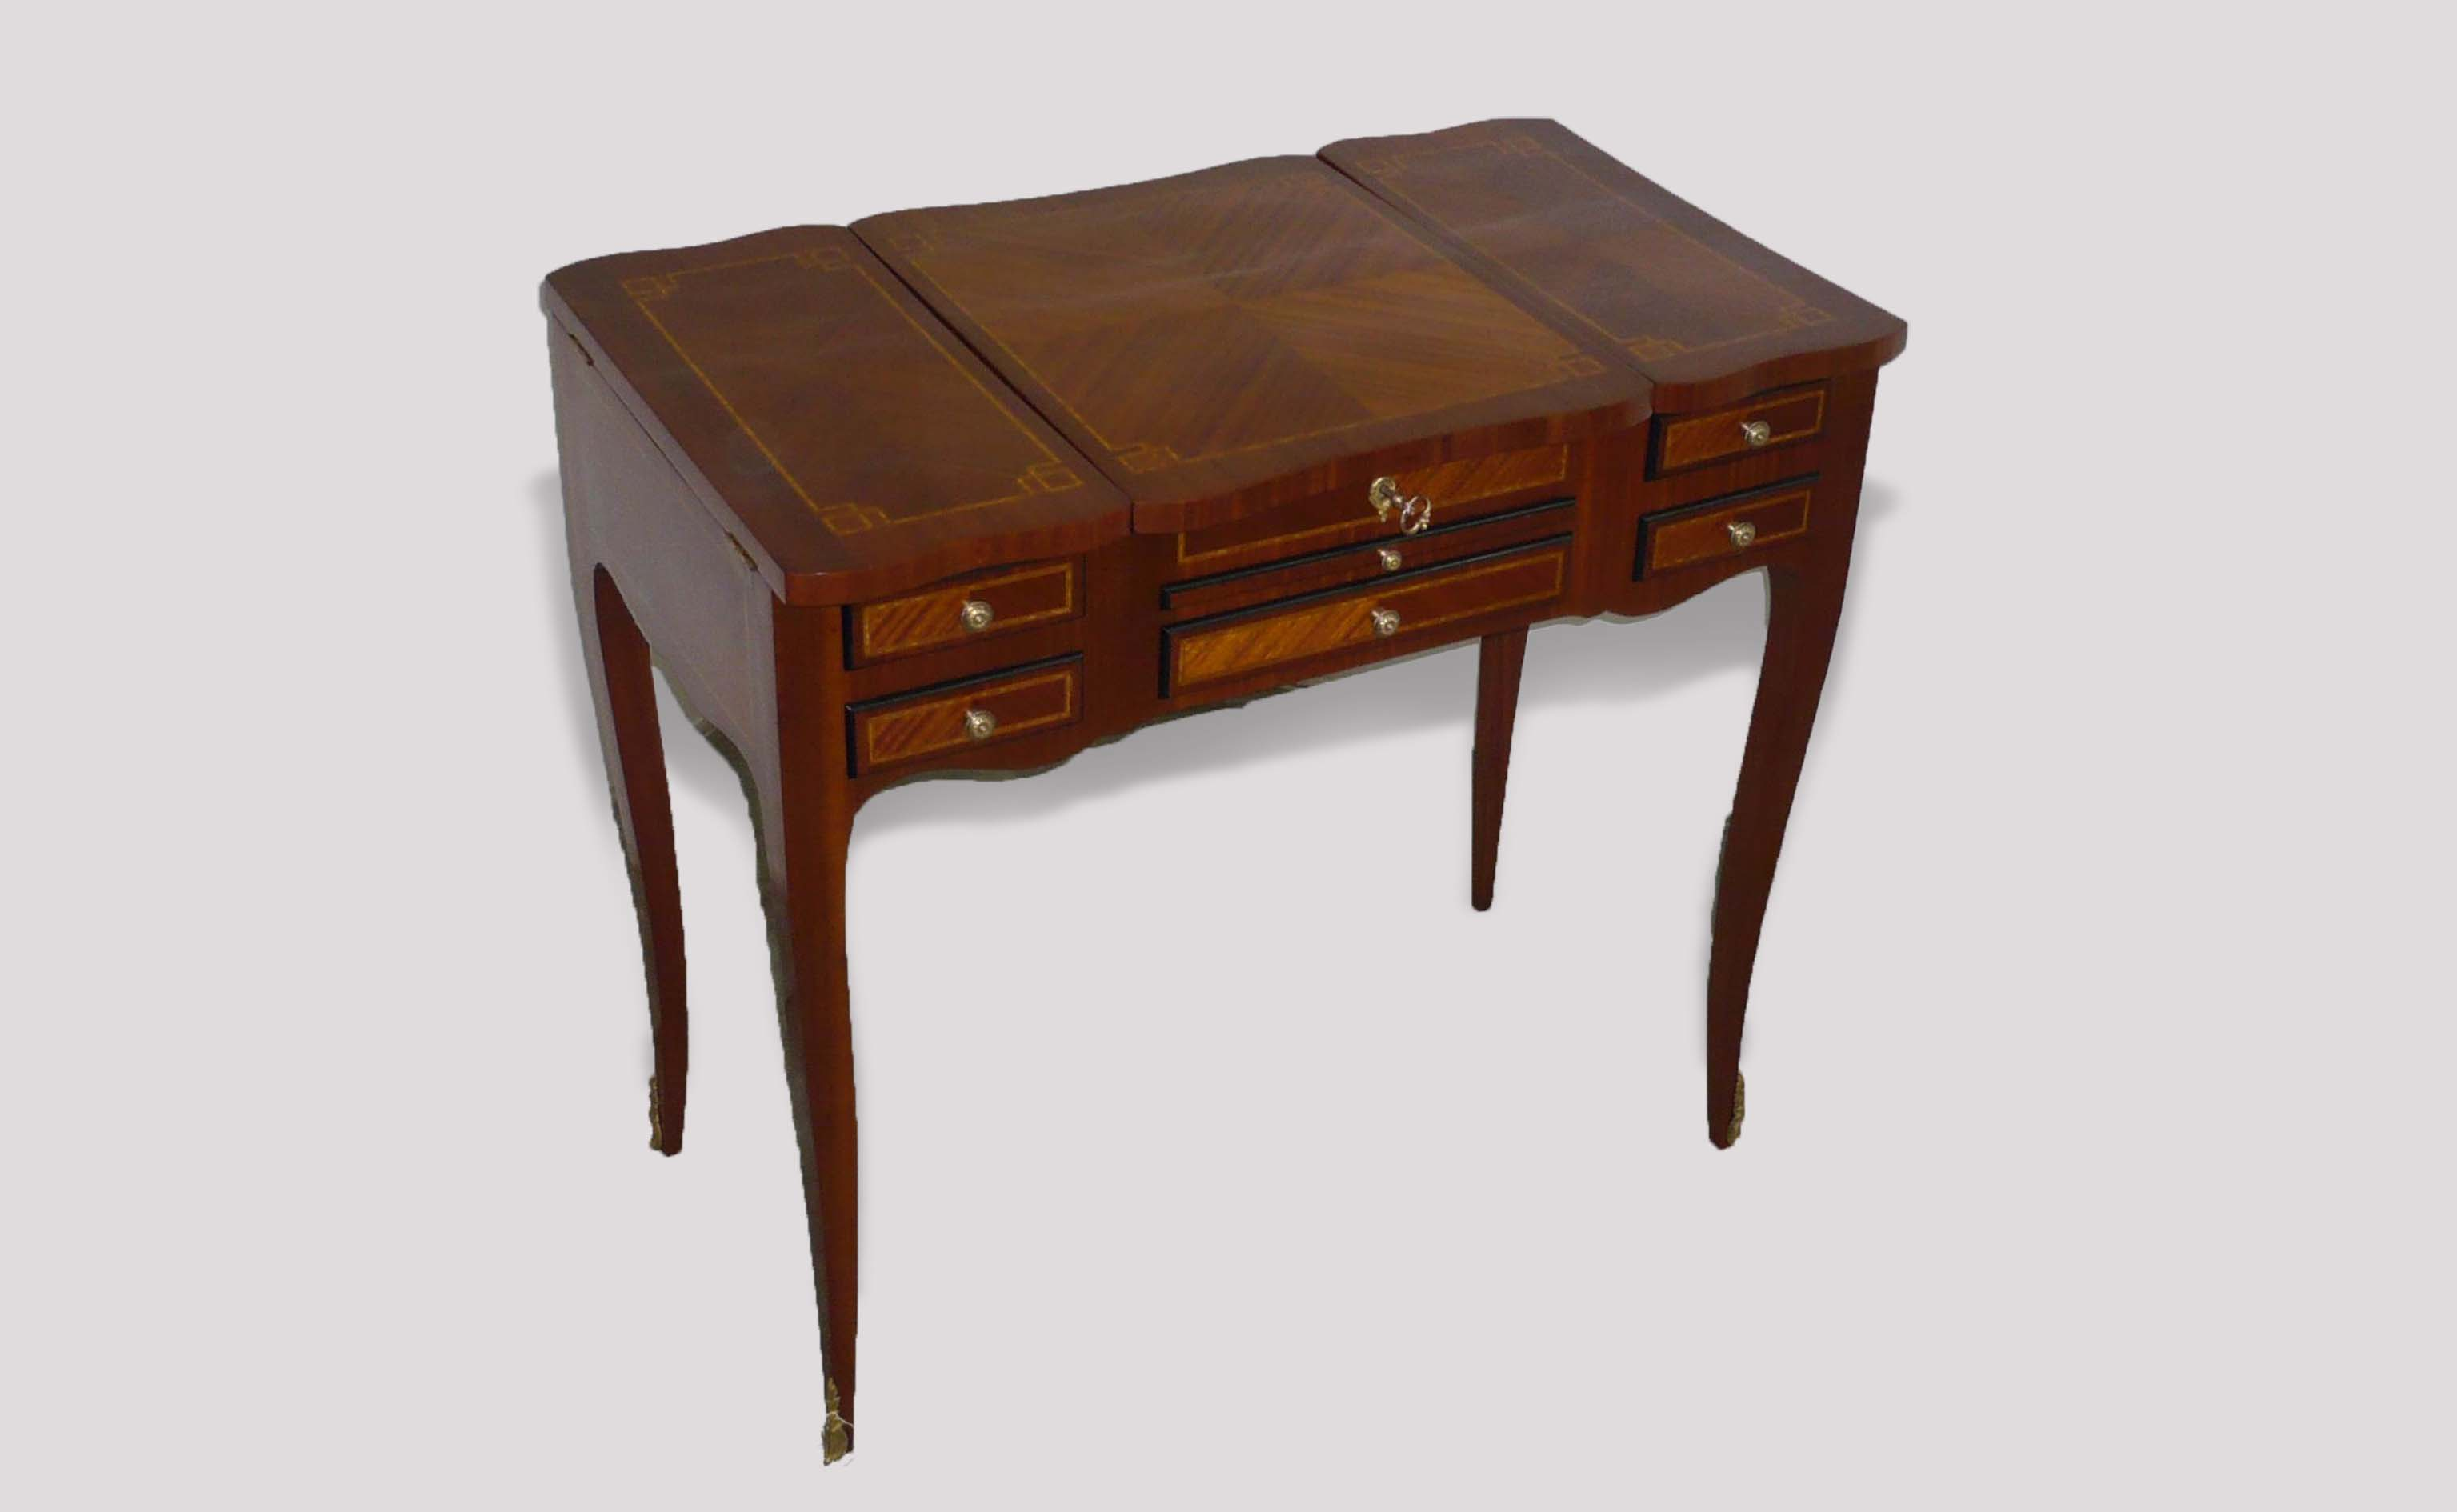 Destockage meuble ile de france nos r alisations for Destockage meuble